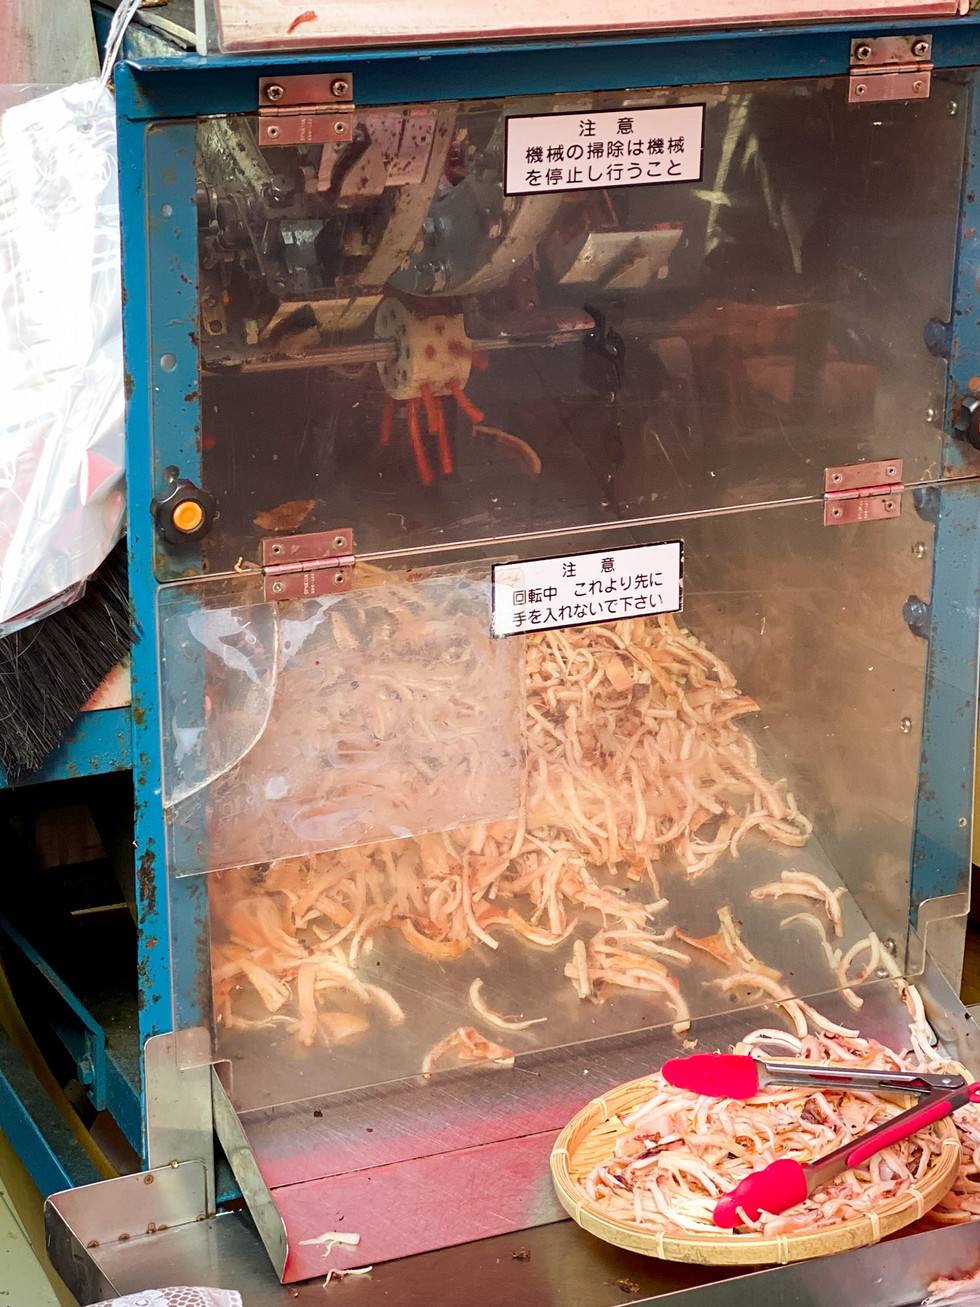 Dried Shrimp Vending Machine - Japan